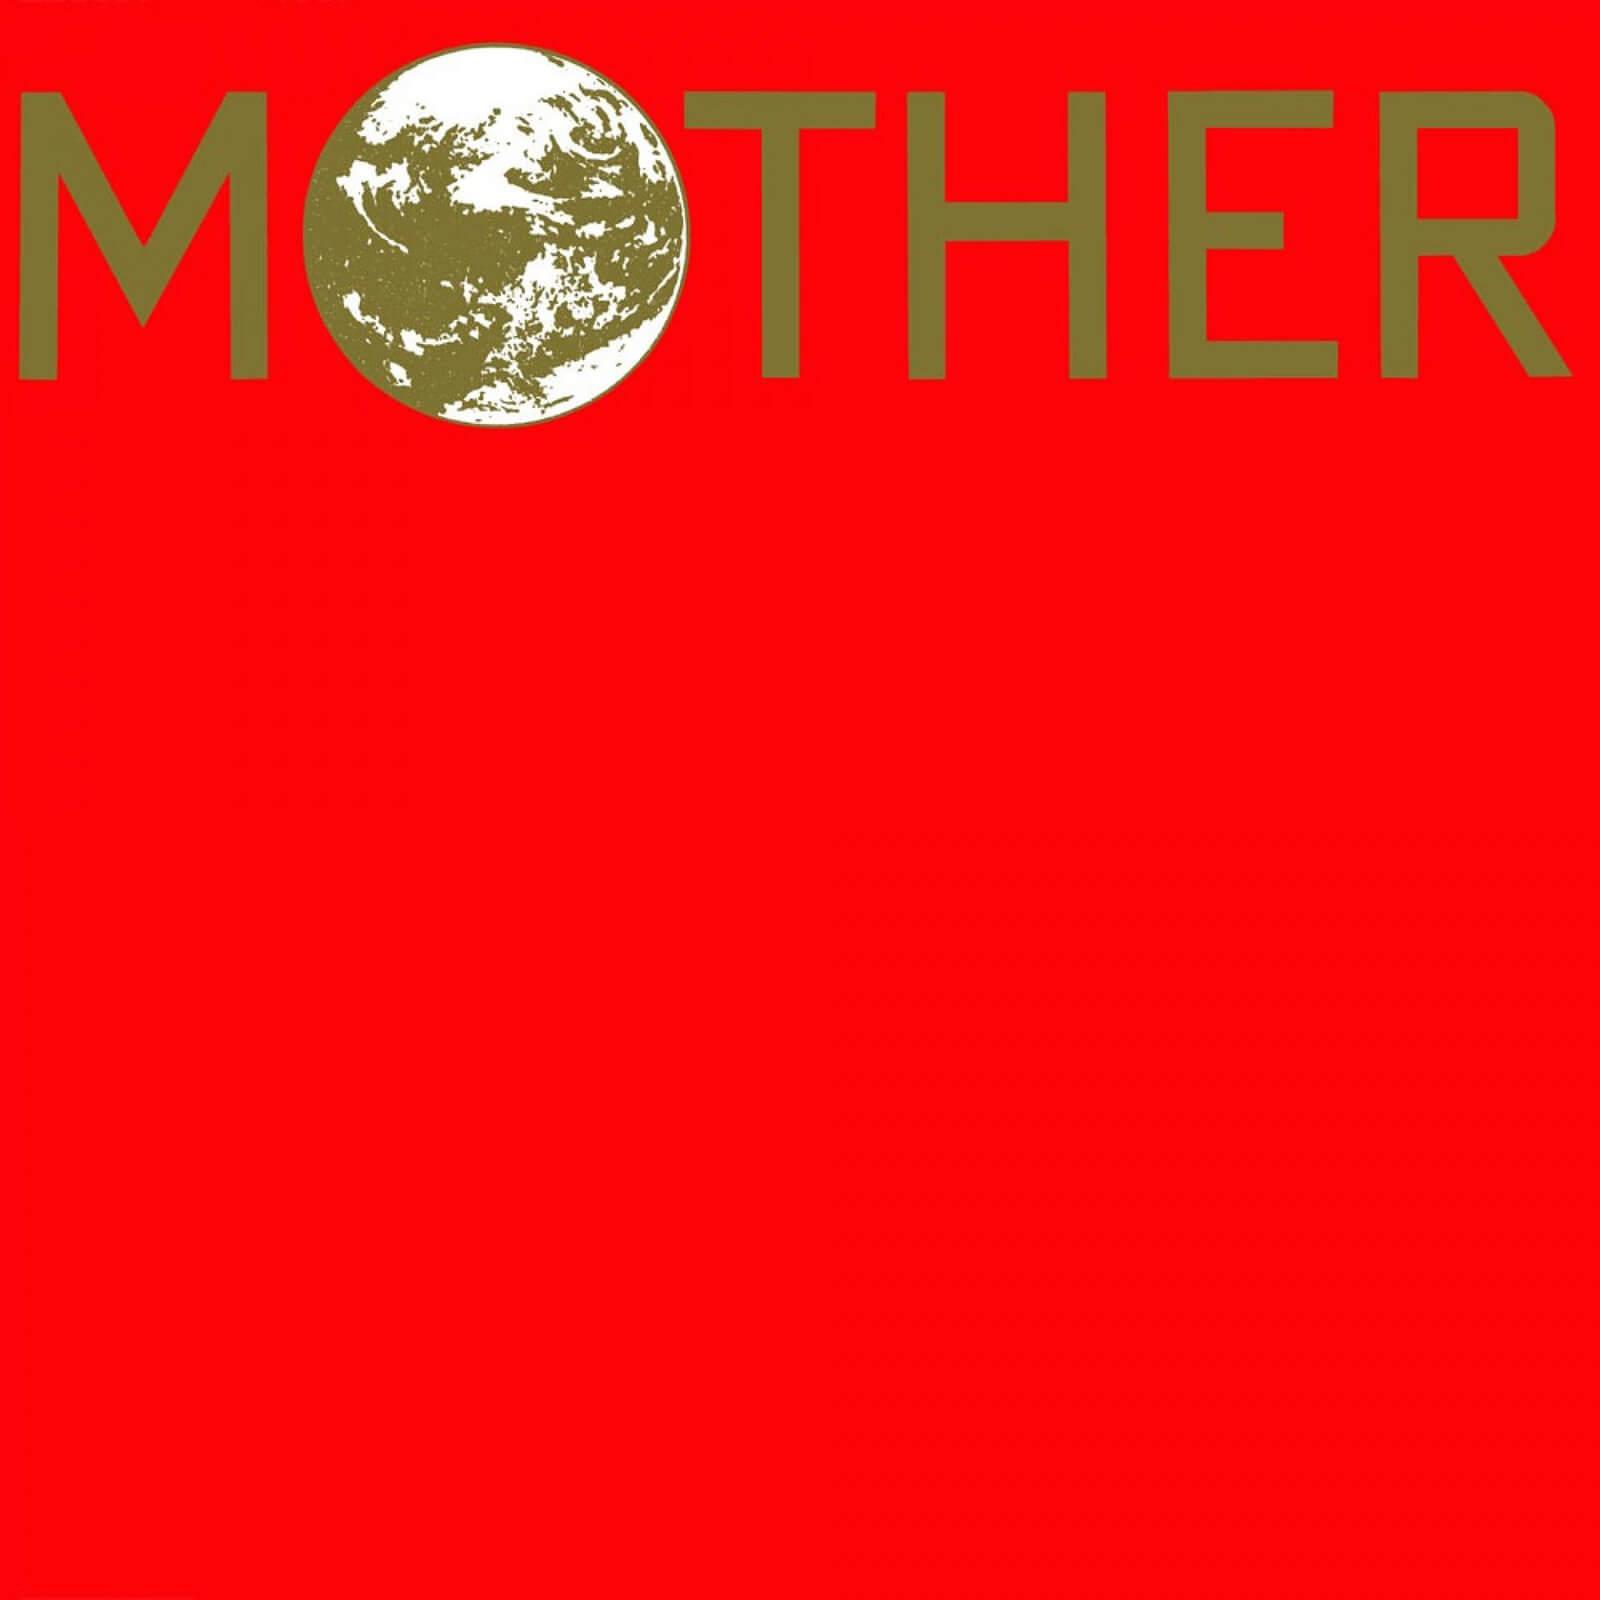 Ship to Shore MOTHER (Original Video Game Soundtrack) 2xLP